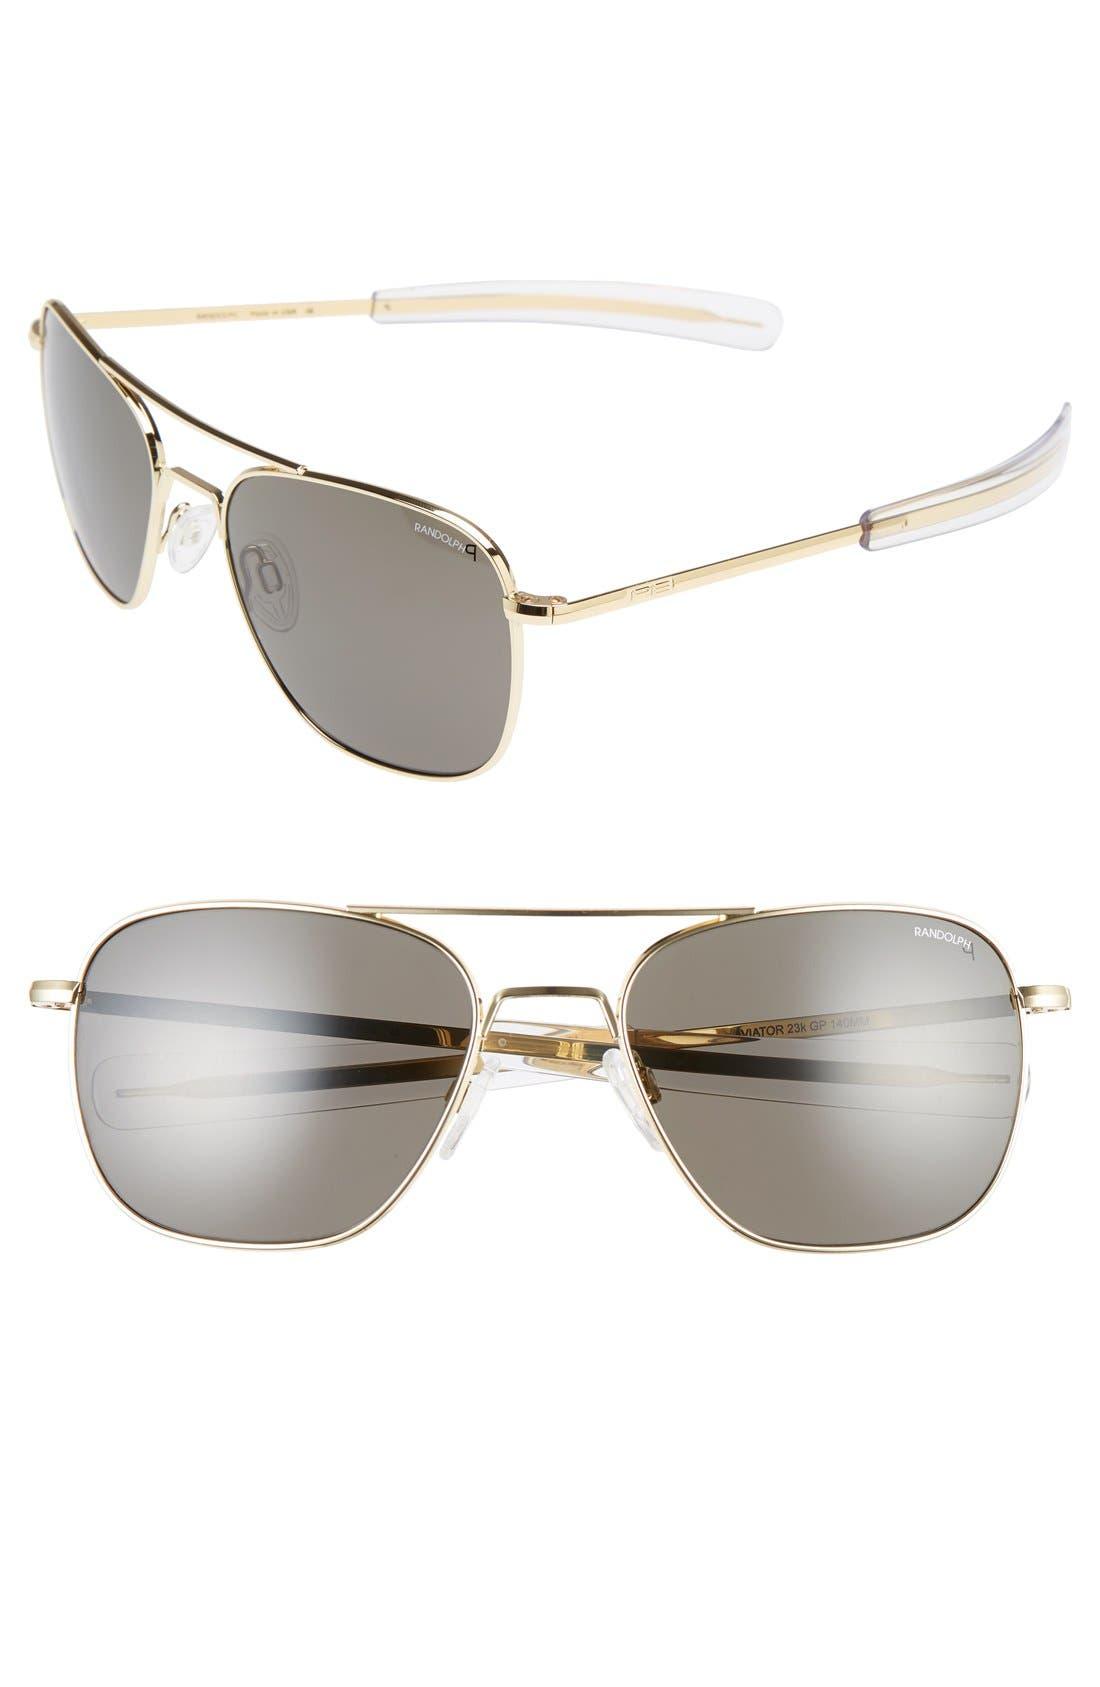 Main Image - Randolph Engineering 58mm Polarized Aviator Sunglasses